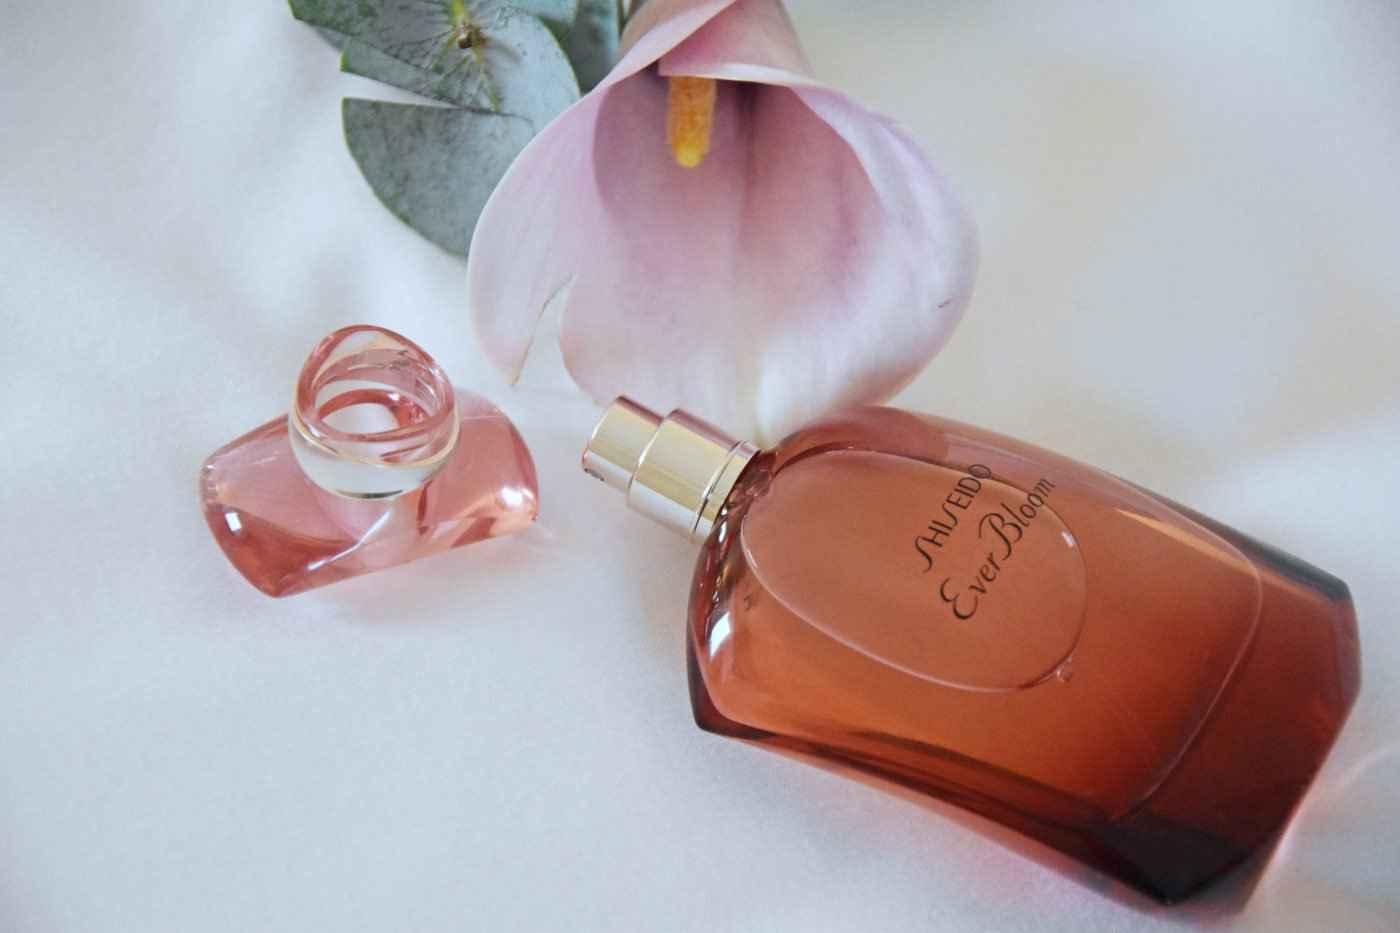 everbloom shiseido perfume